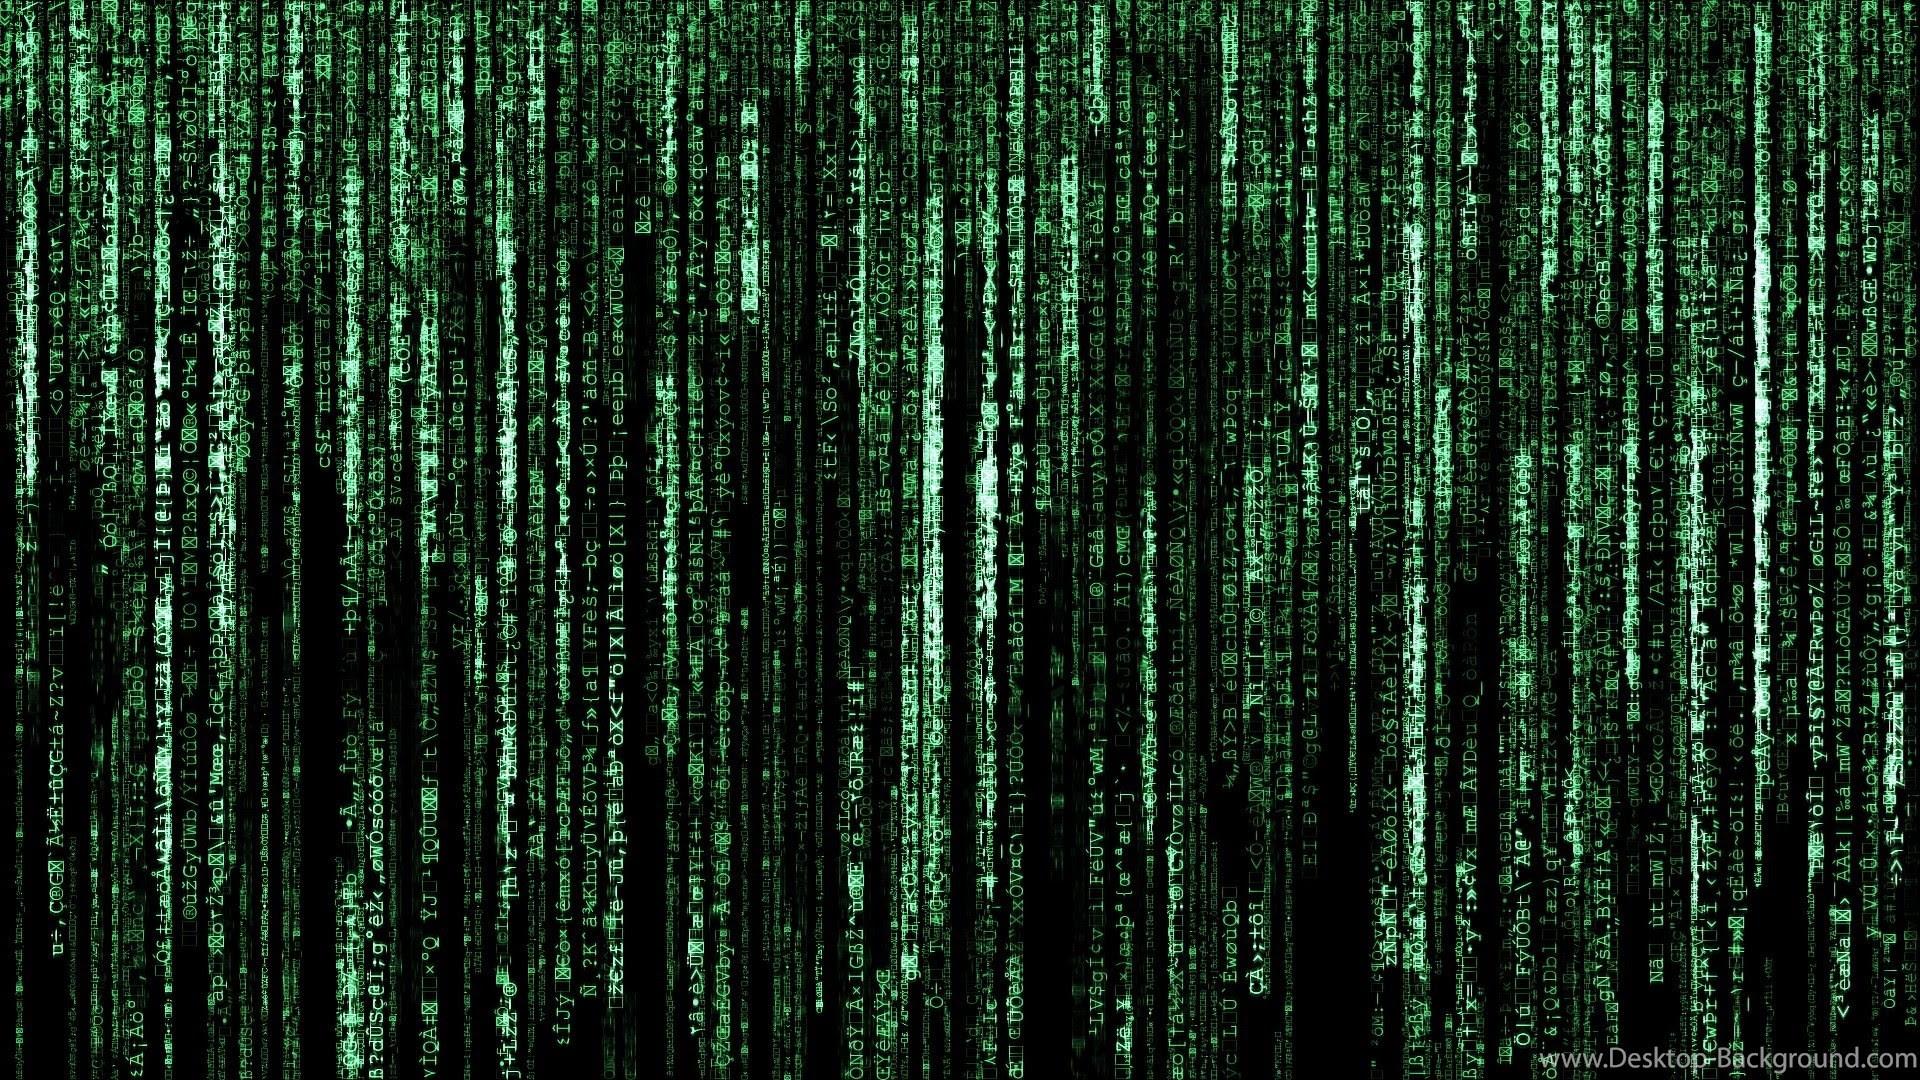 Hacker Background (62+ images)